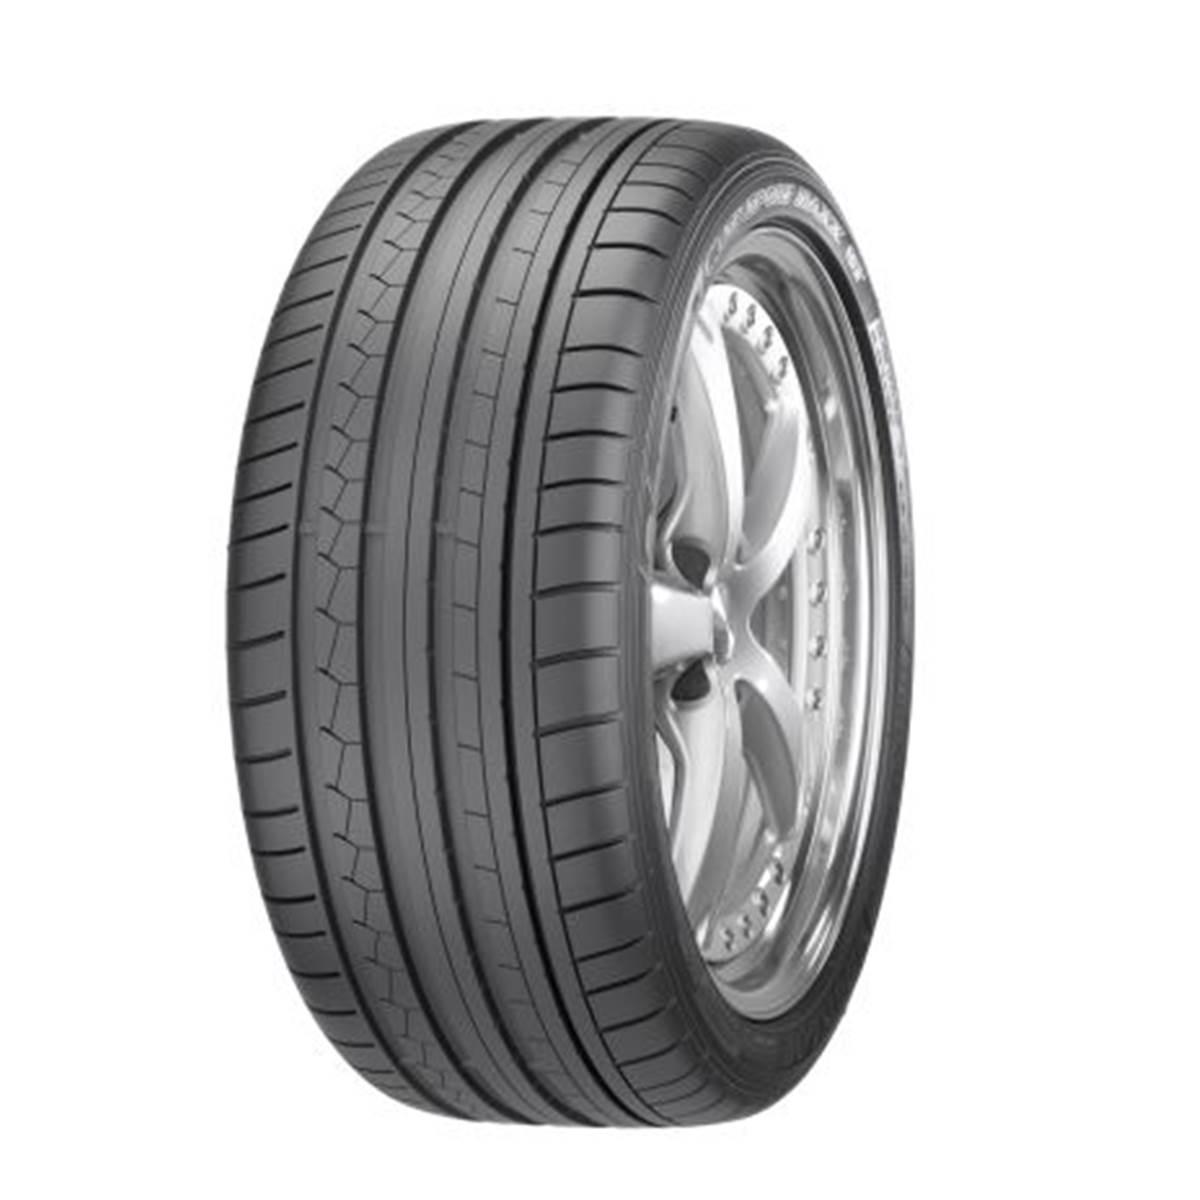 Dunlop Sp Sport Maxx Gt Mfs Xl (j)